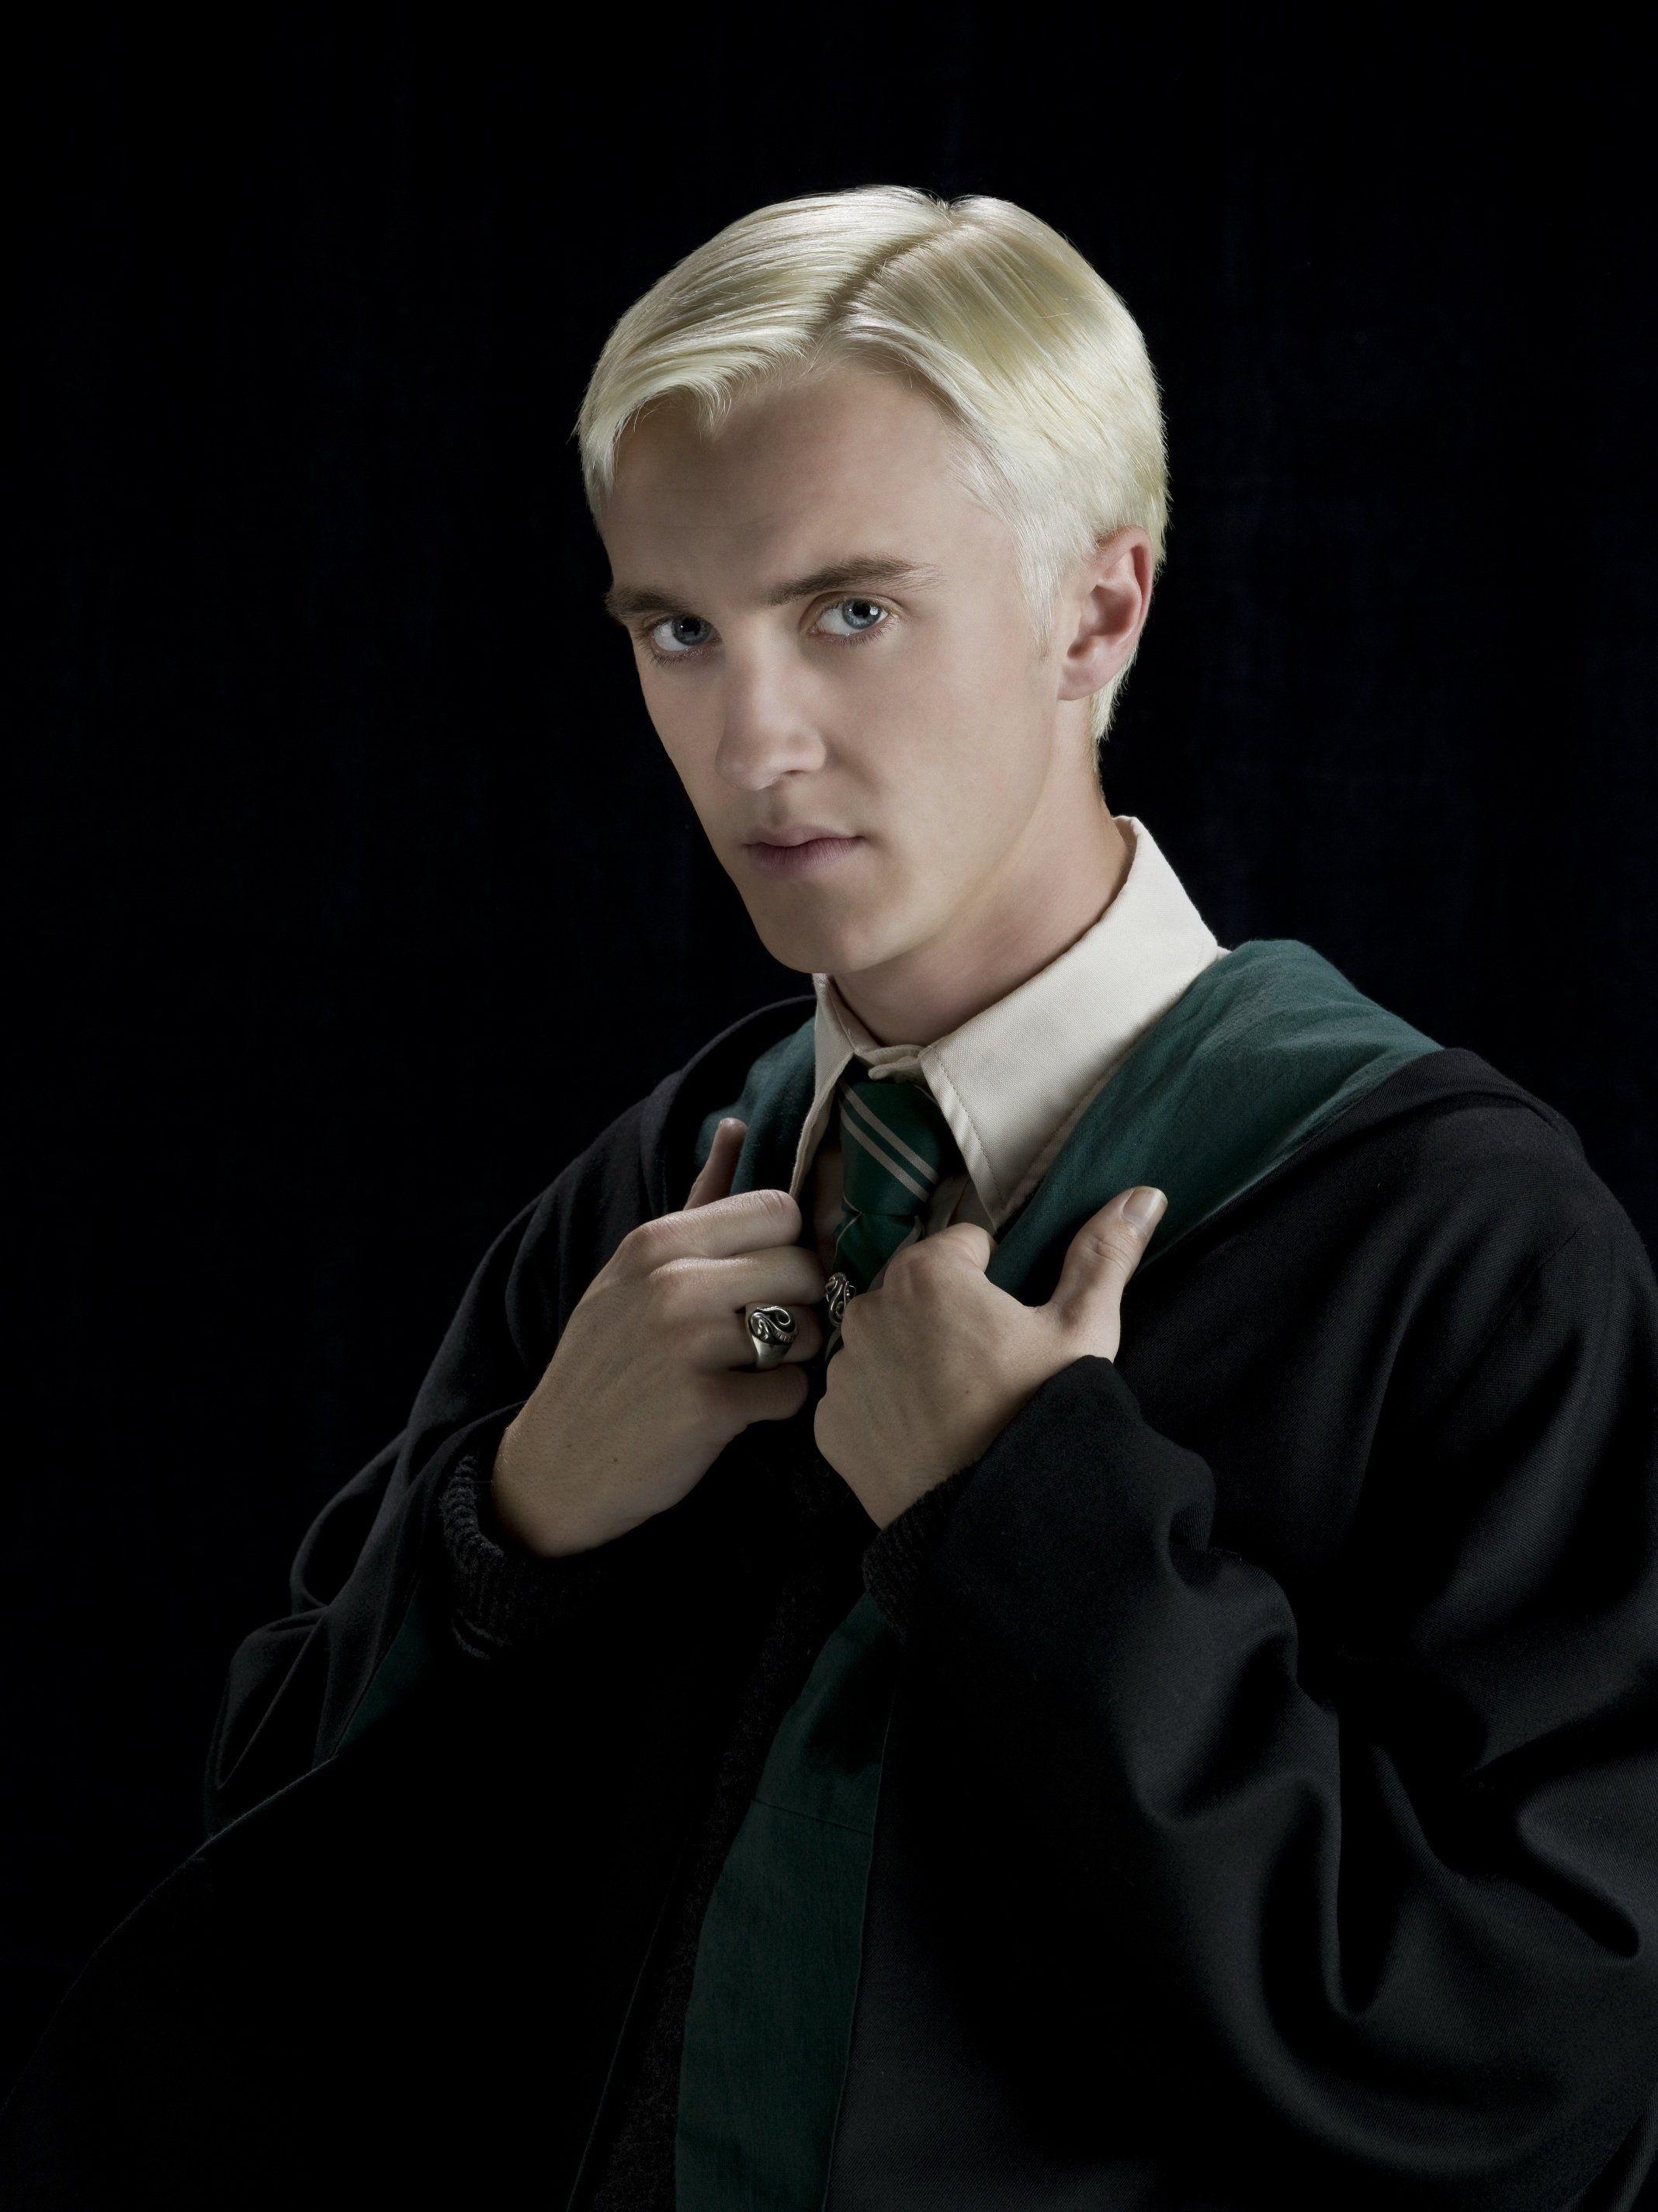 Harry Potter Slytherin Uniform Cosplay Costume Tom Felton